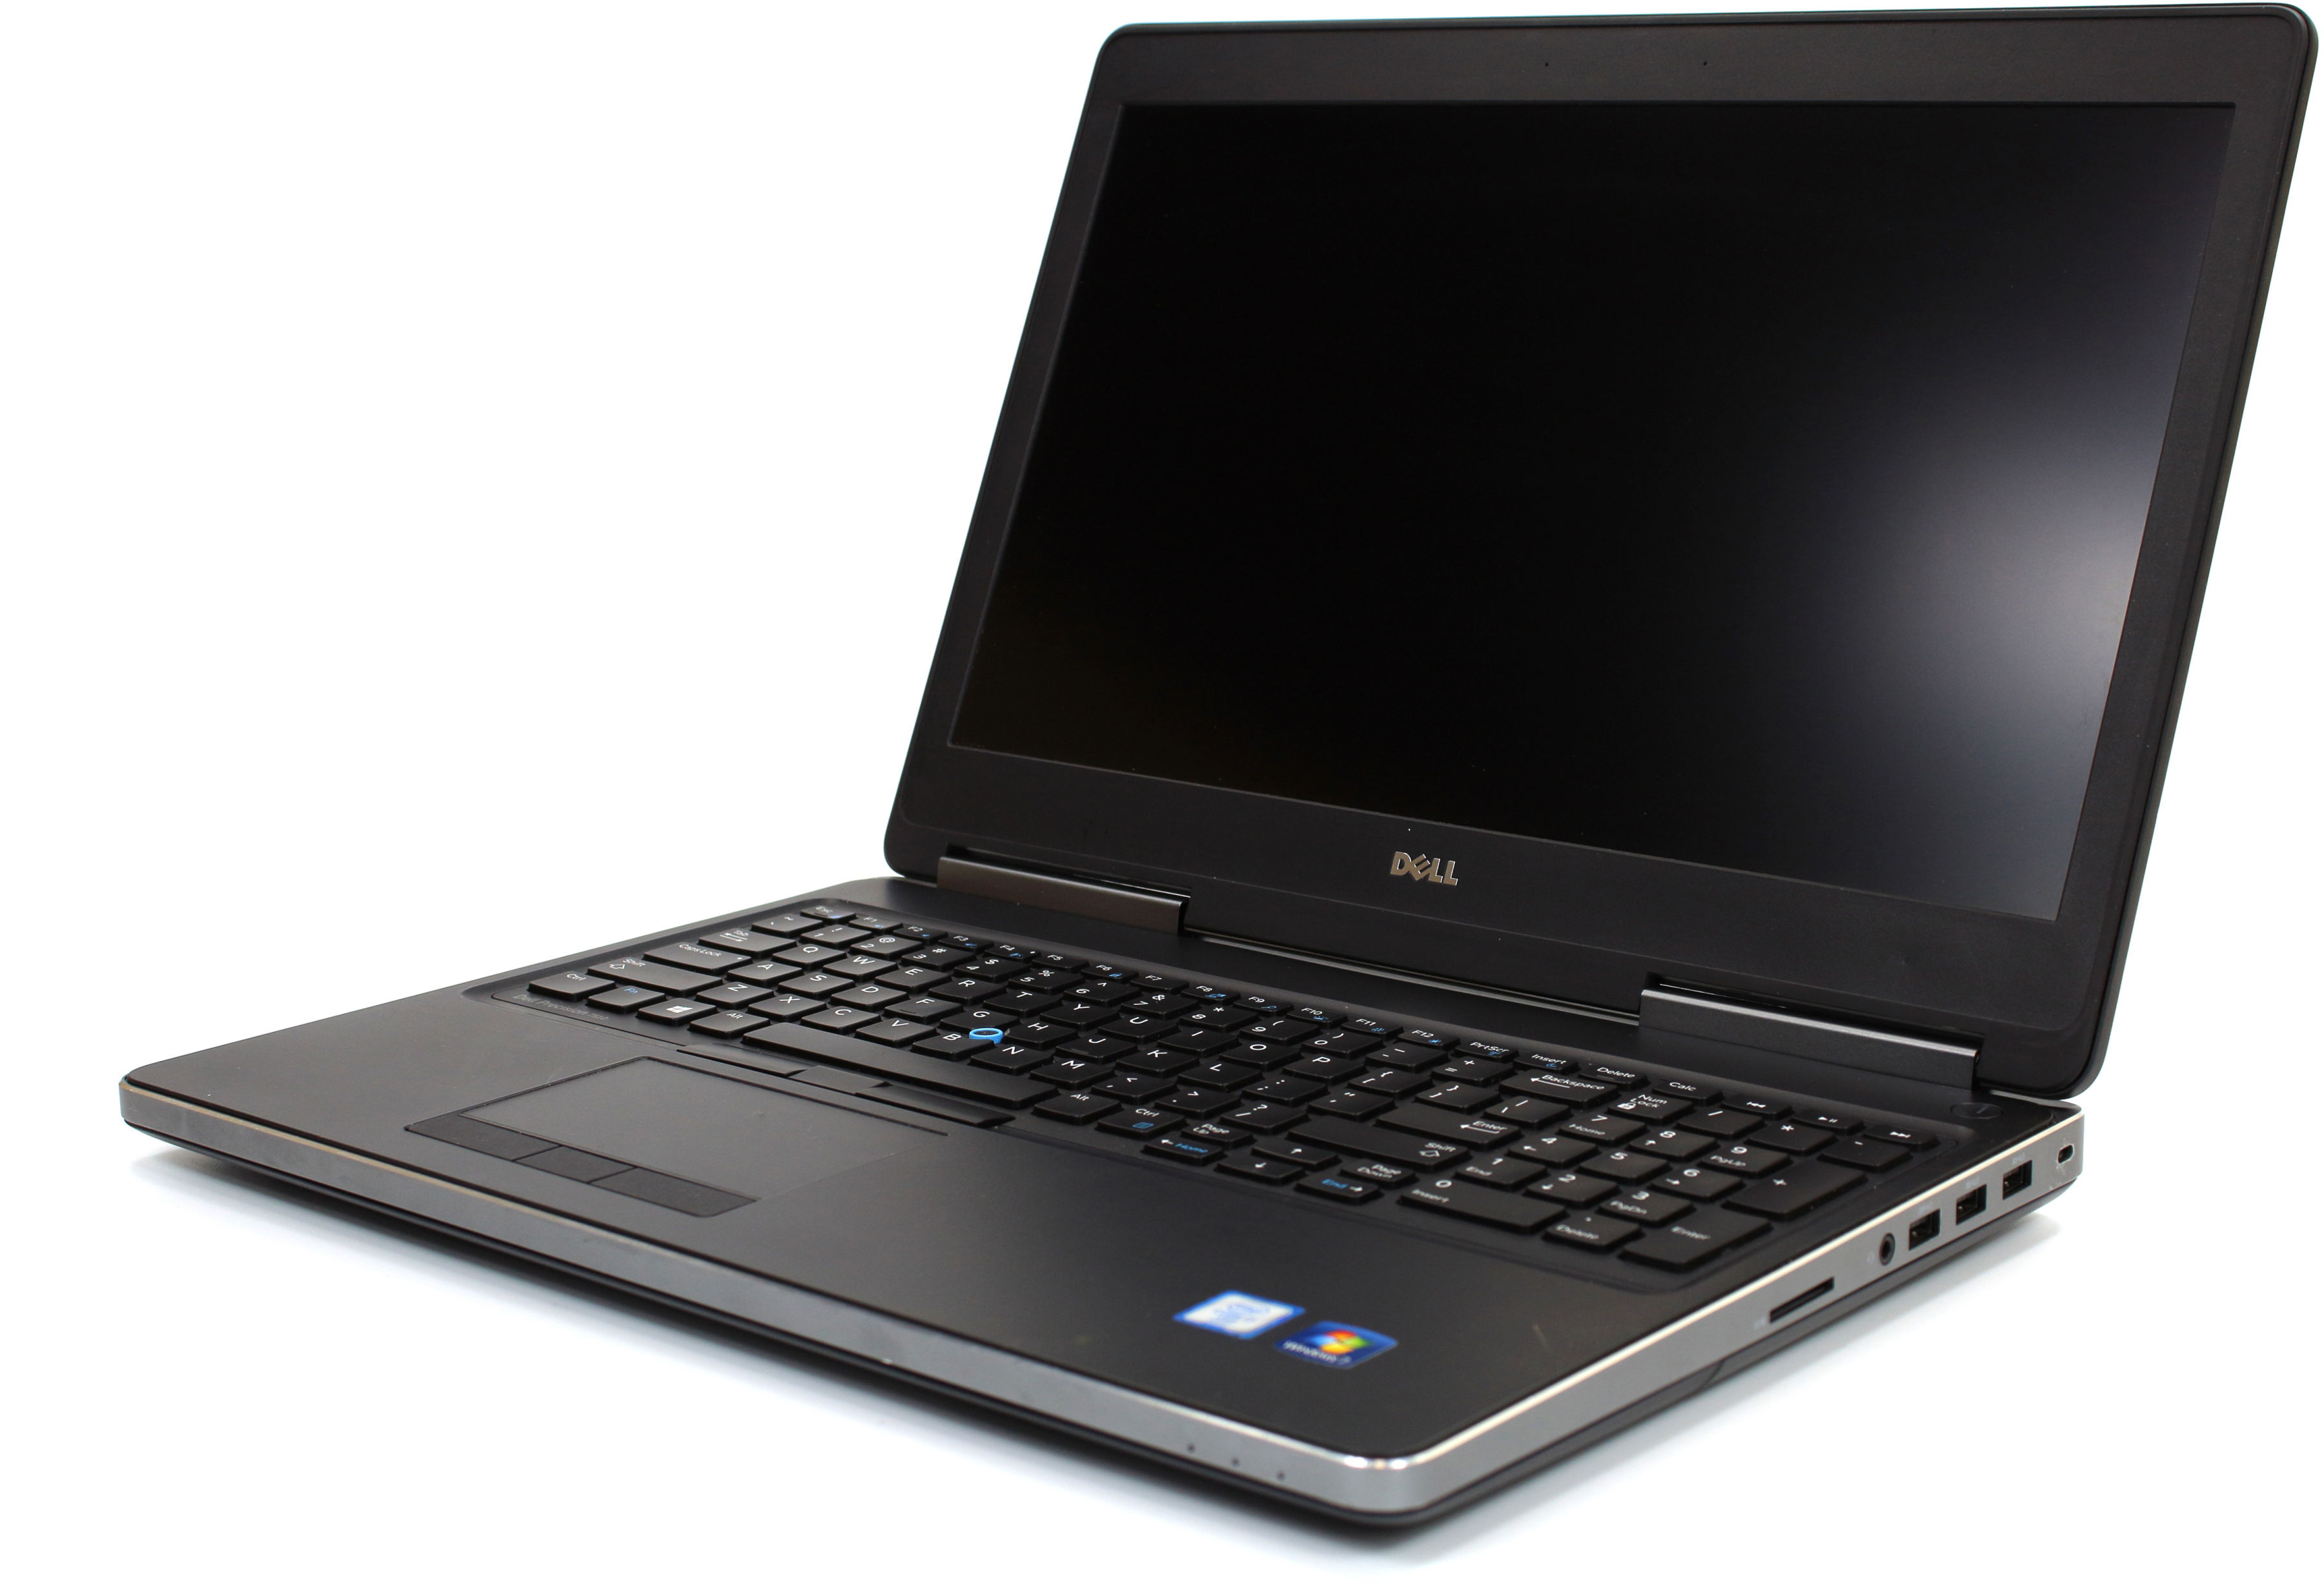 "Laptop DELL Precision 7510 15,6"" FHD IPS i7-6820HQ 16GB 480GB SSD nVidia M1000M - Windows 7 Pro (Klasa A-)"